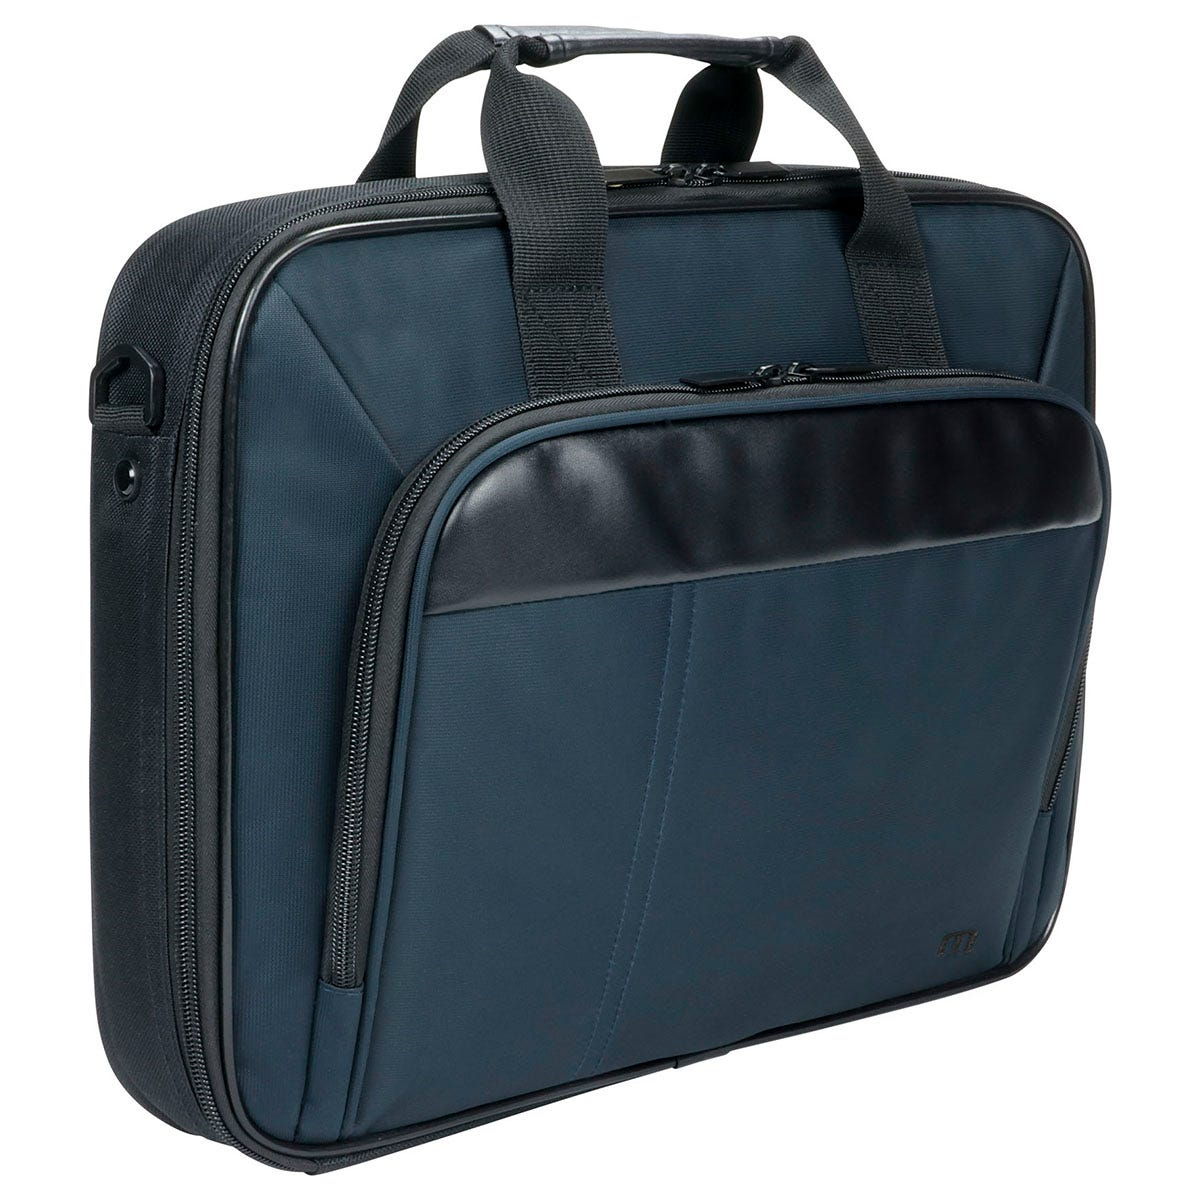 Mobilis Exclusive 3 One Laptop Bag 11-14